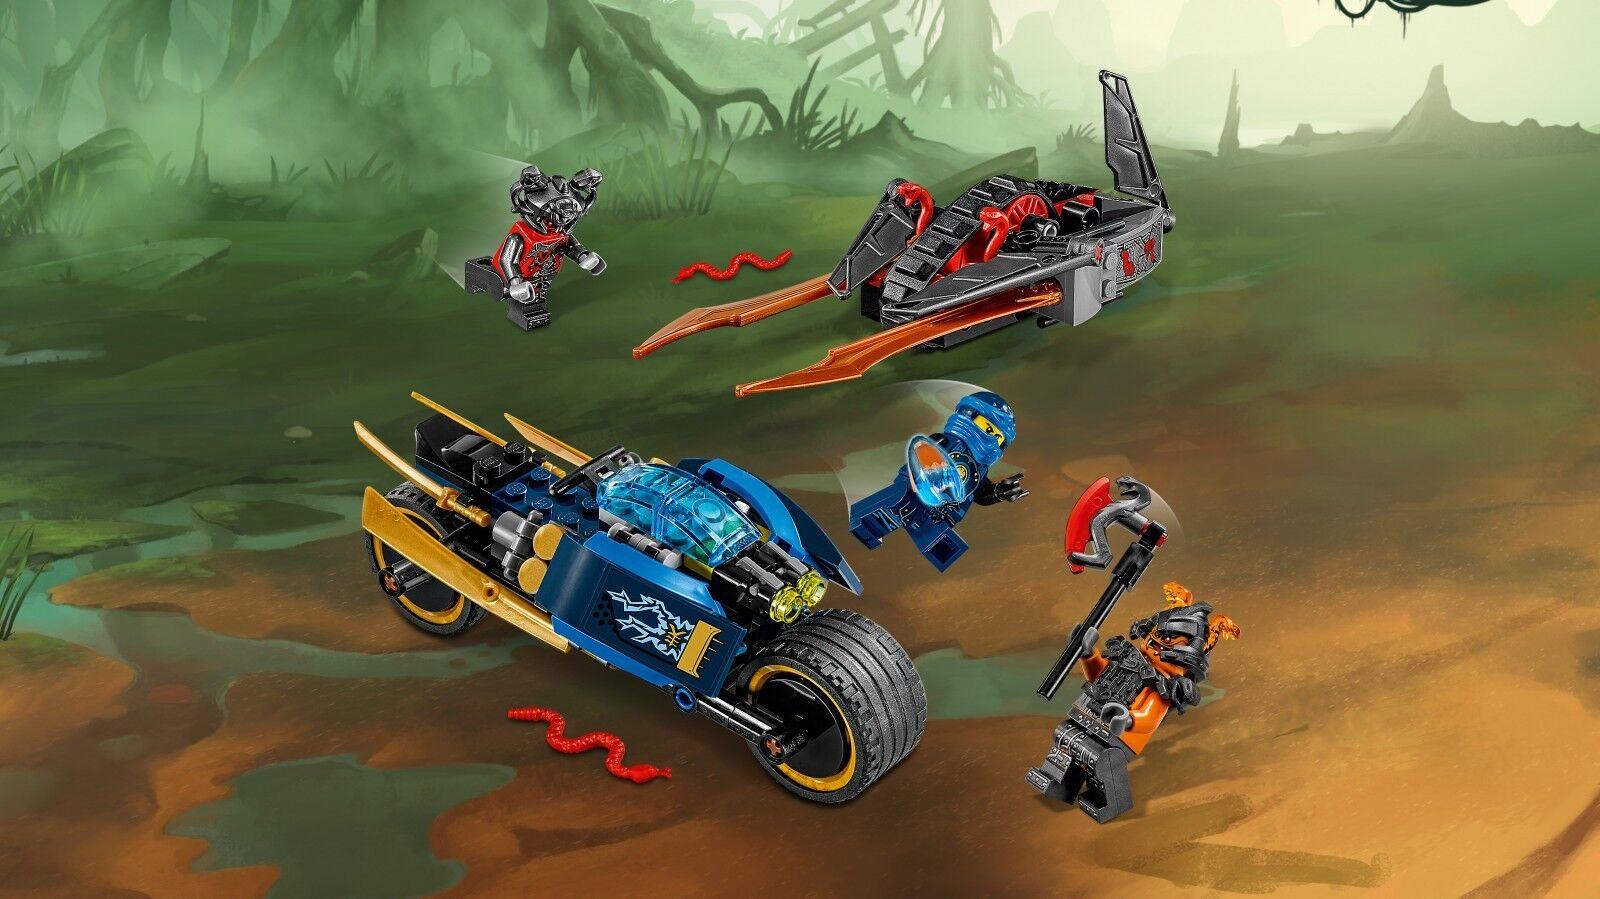 LEGO ® ® ® Ninjago ™ 70622 déserts speeder neuf neuf dans sa boîte _ DESERT Lightning NEW En parfait état, dans sa boîte scellée Boîte d'origine jamais ouverte 1c7be0